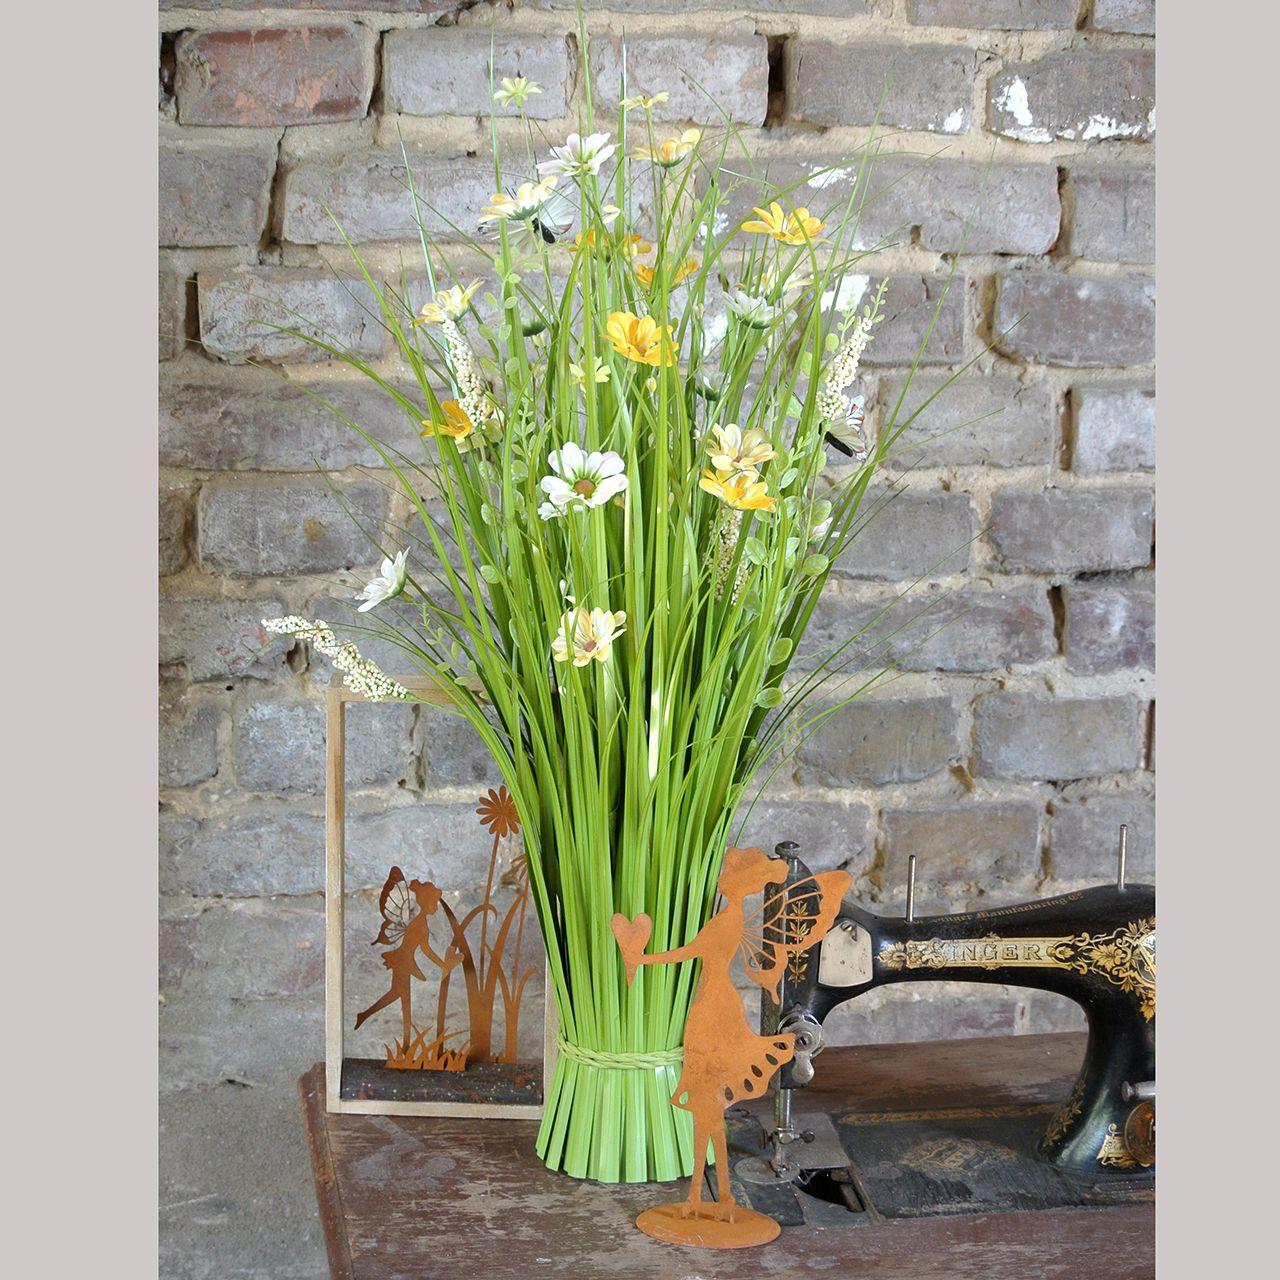 Flok græs med blomster og sommerfugle Orange 70cm